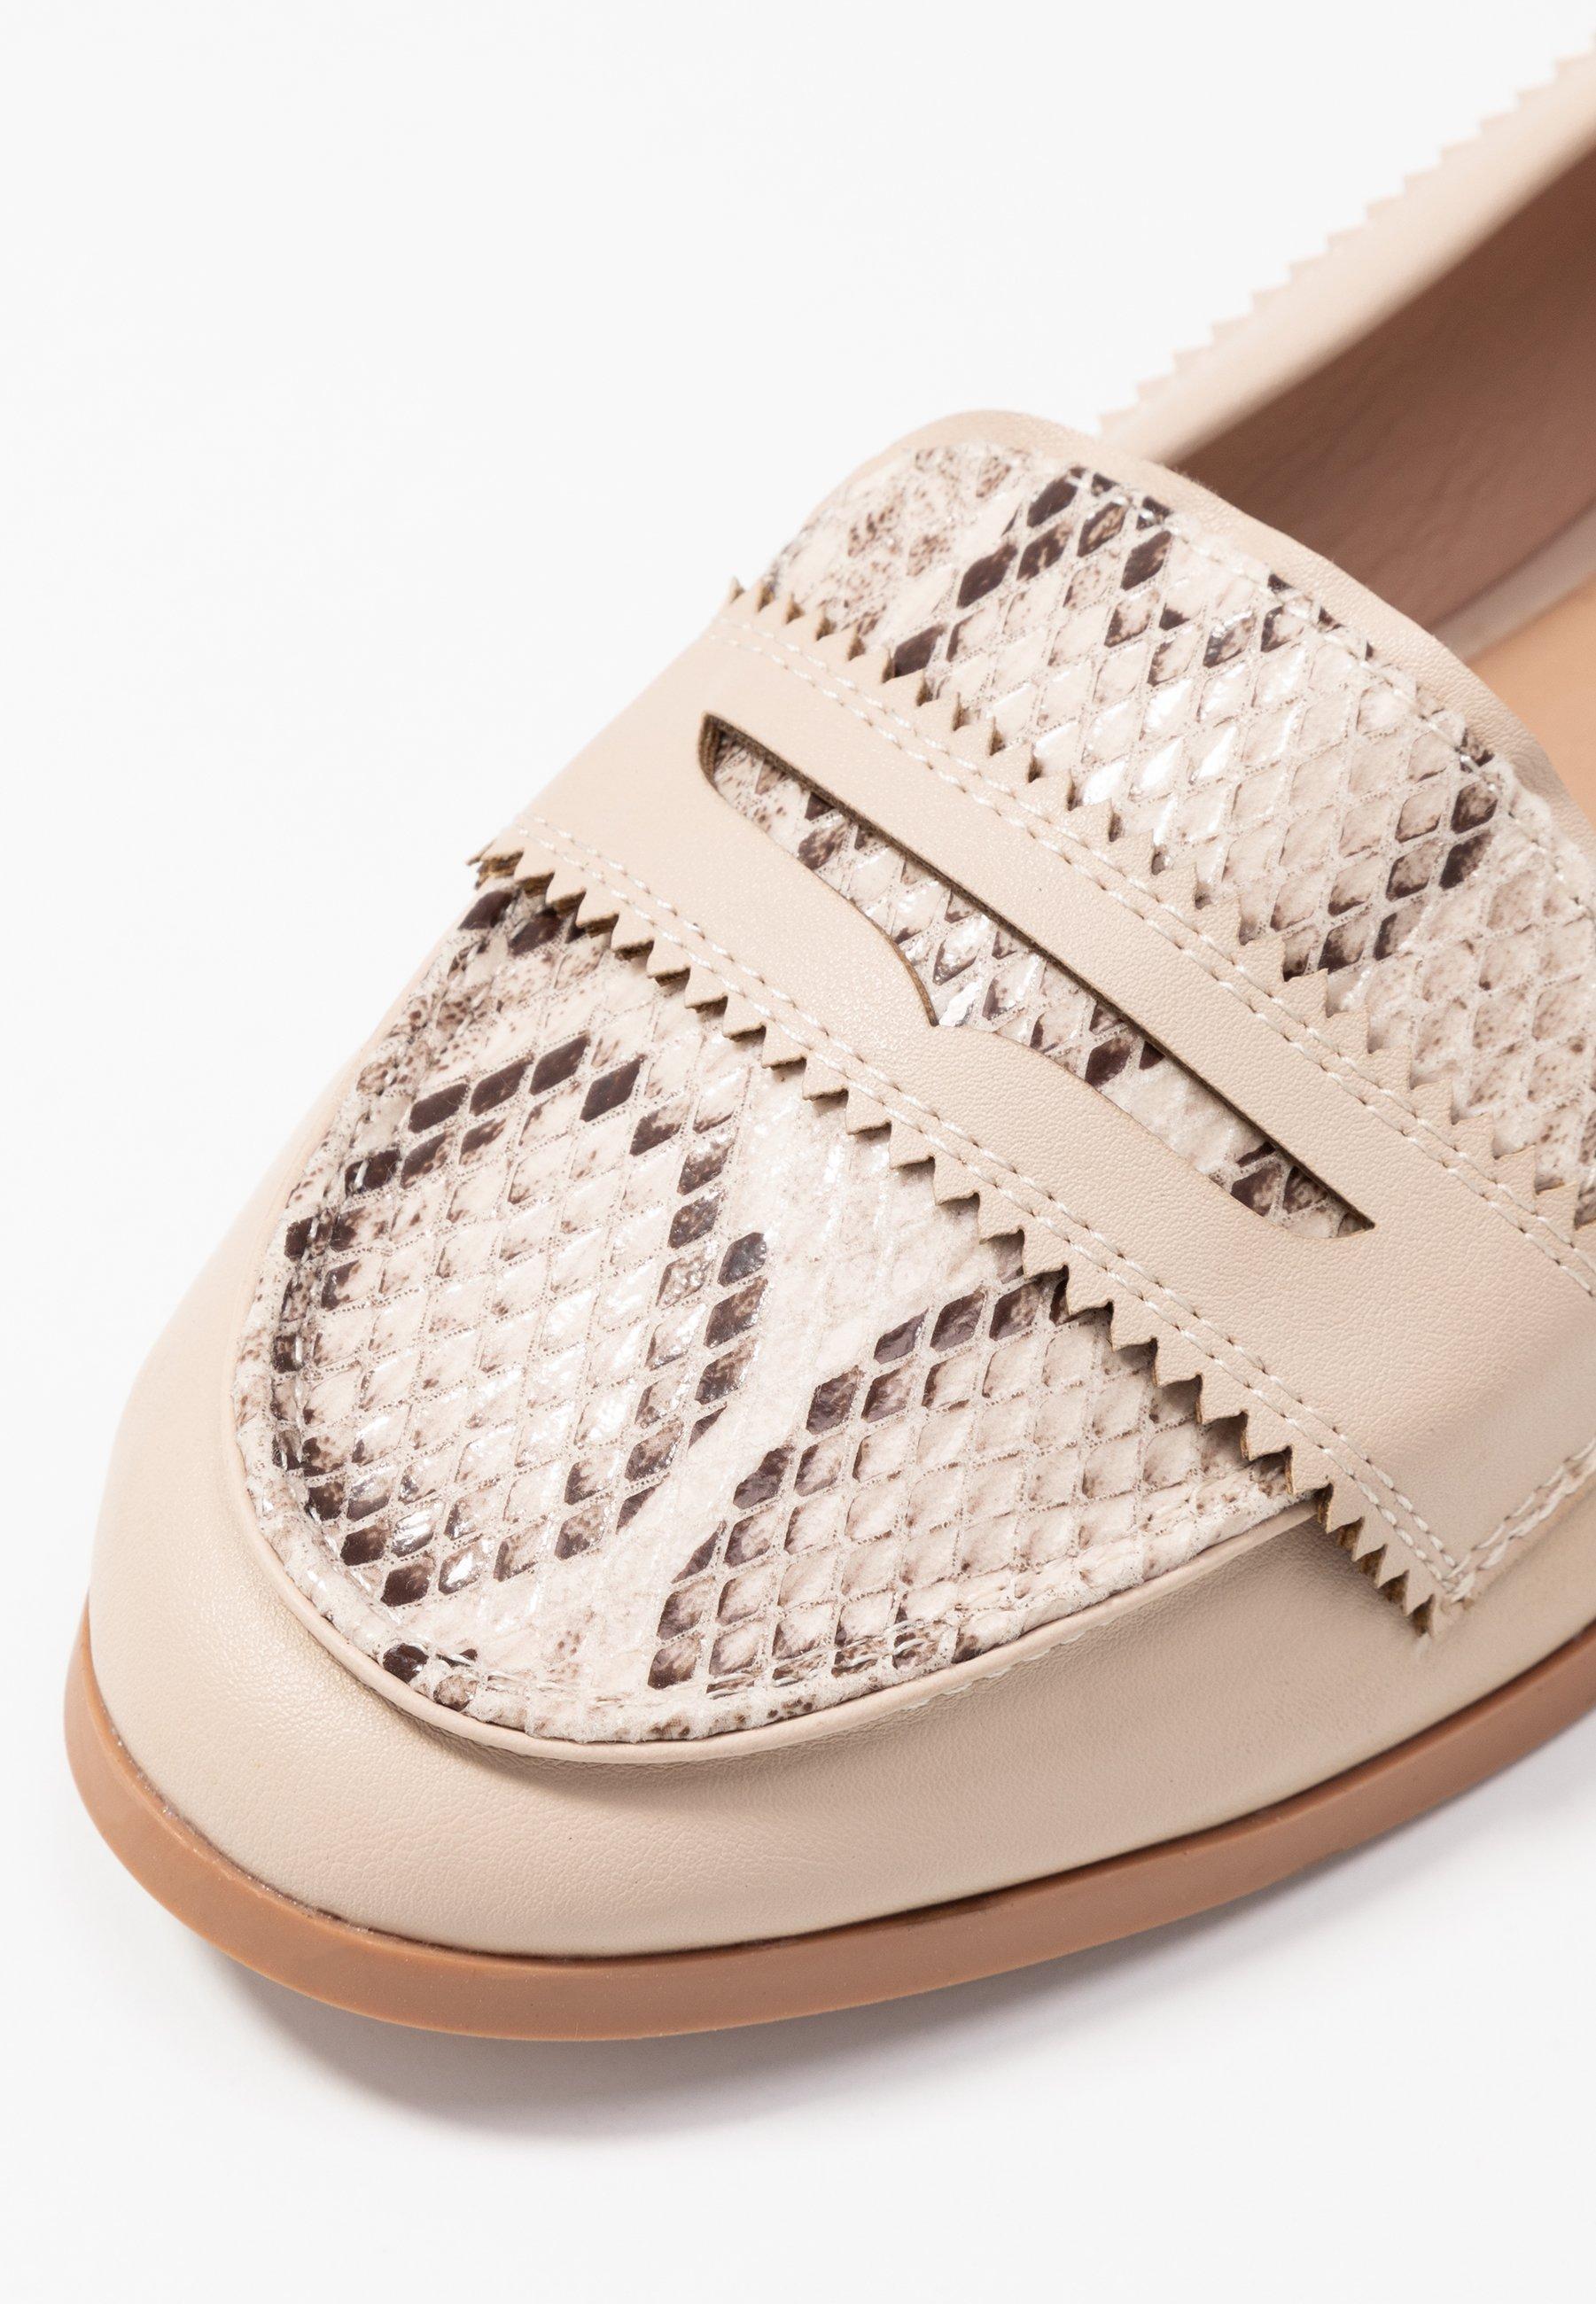 Dorothy Perkins Loyle Snake Loafer - Mocassins Cream